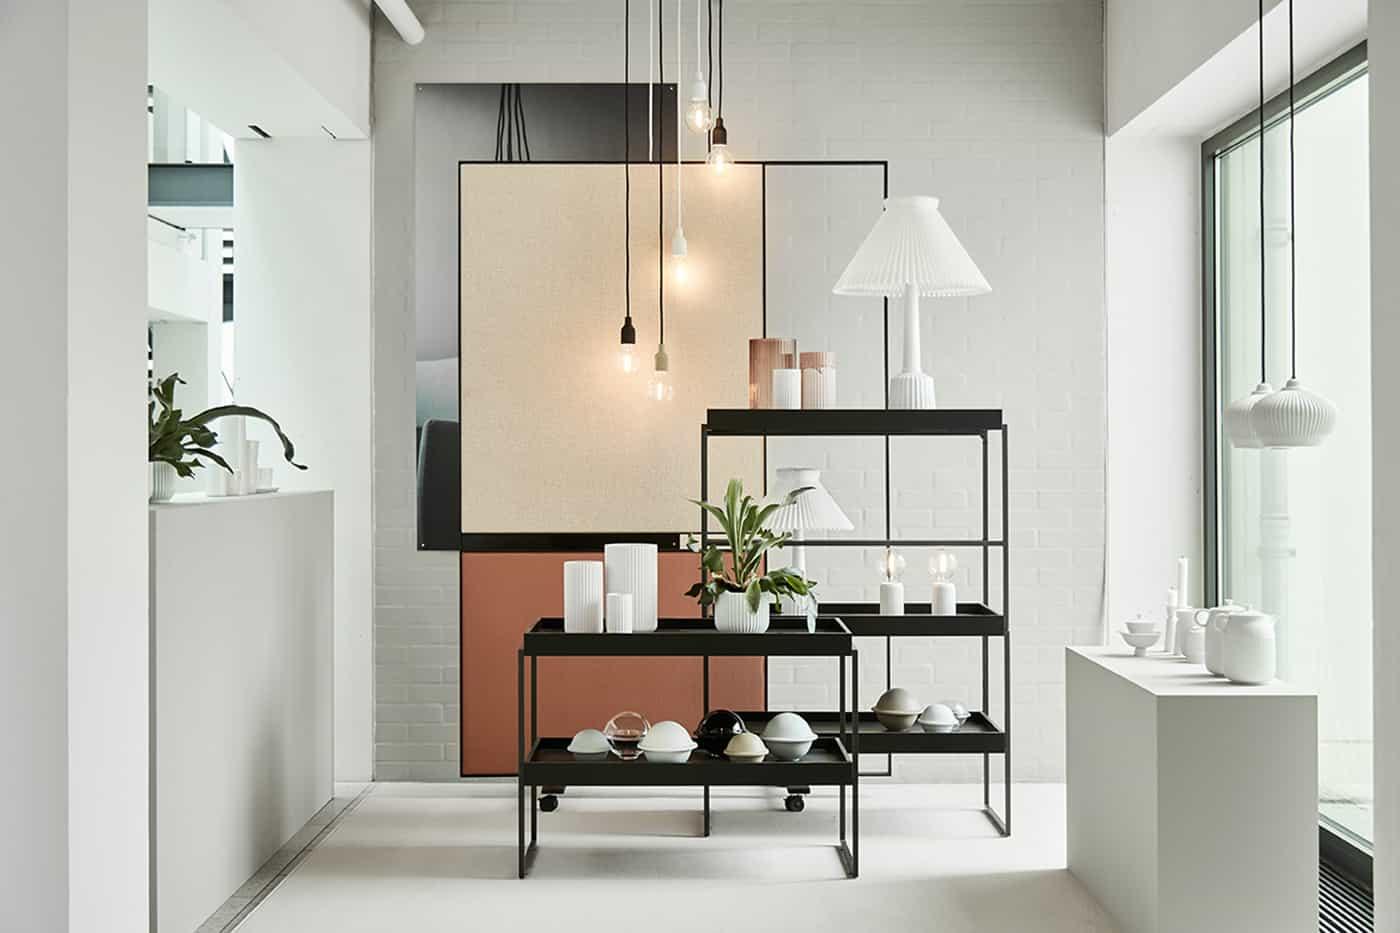 RITAarch Rosendahl Design Group, indretning, specialinventar, fleksible rammer, afskærmning